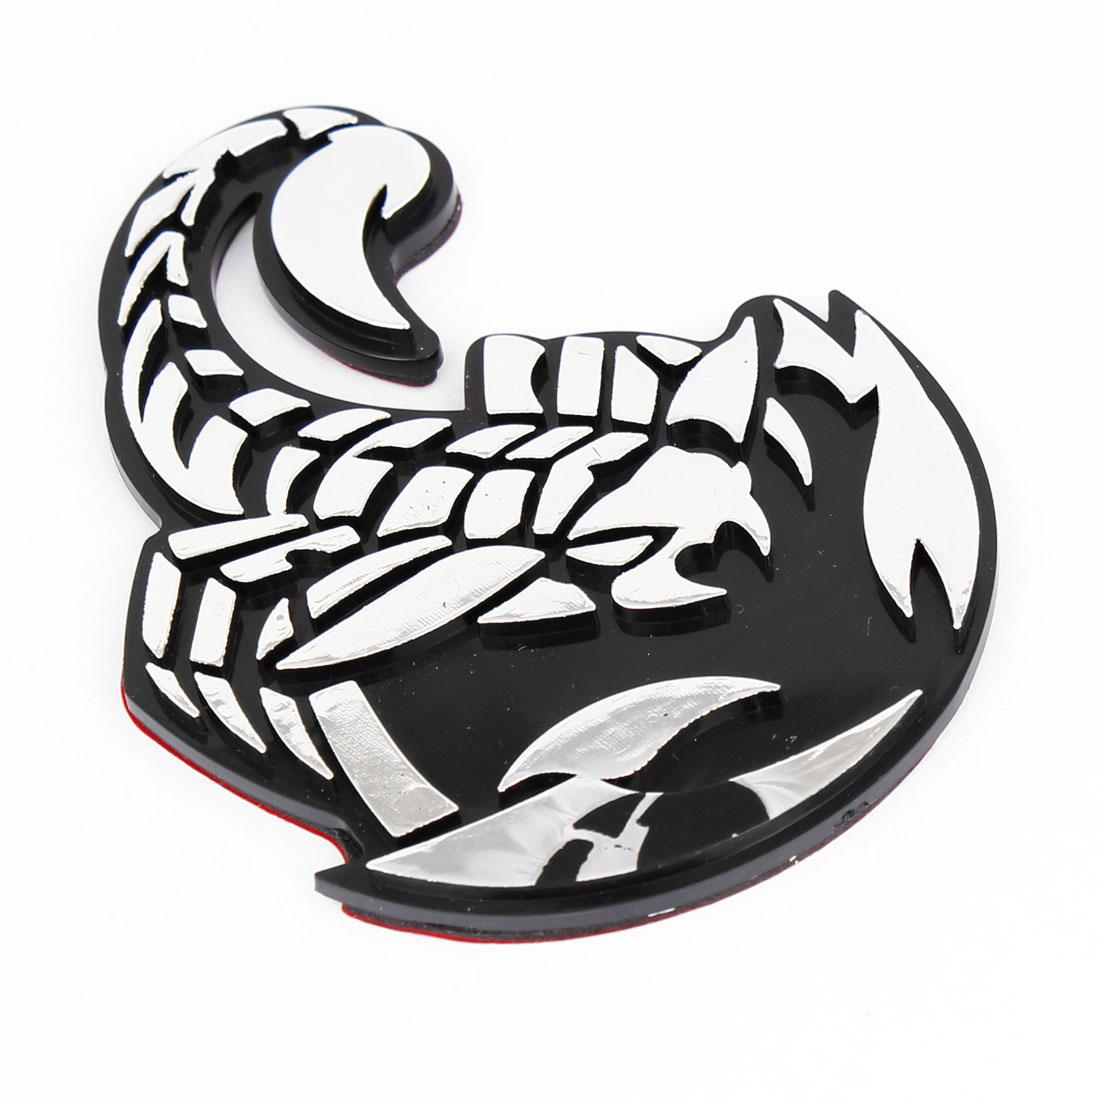 Truck Car Front Hood 3D Plastic Scorpion Design Sticker Emblem Silver Tone Black